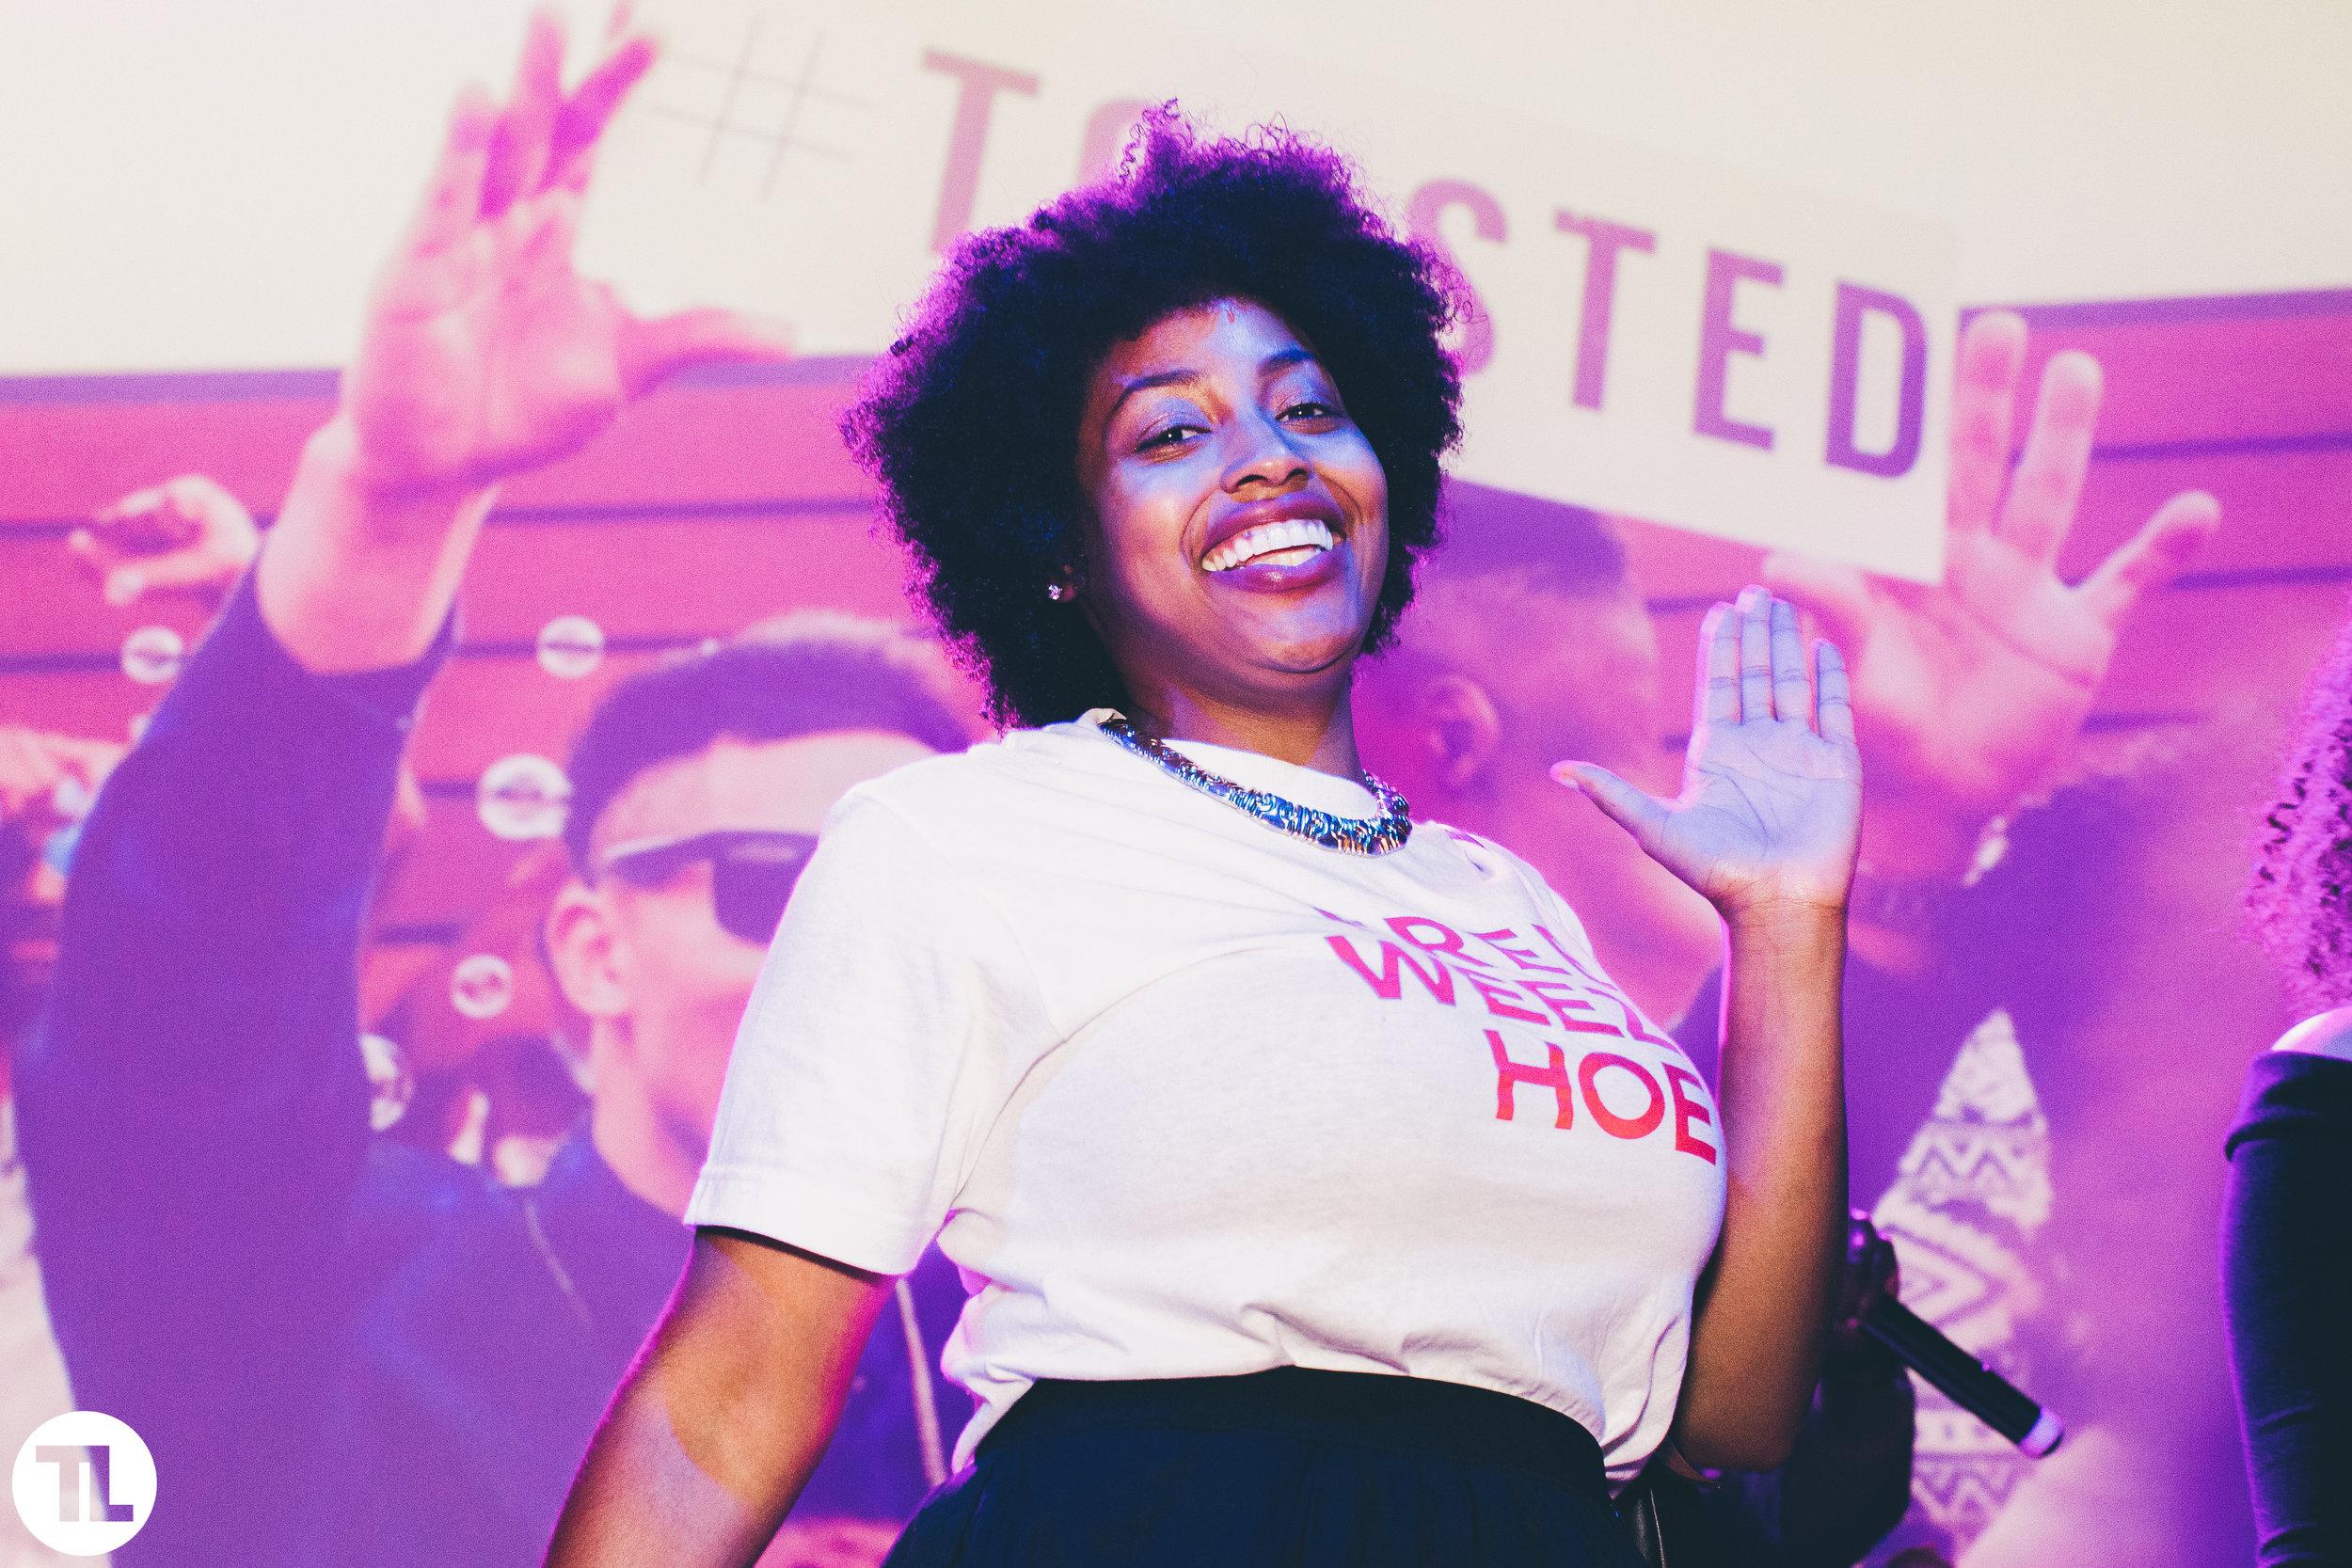 Chicago: Oktoastedfest 2016